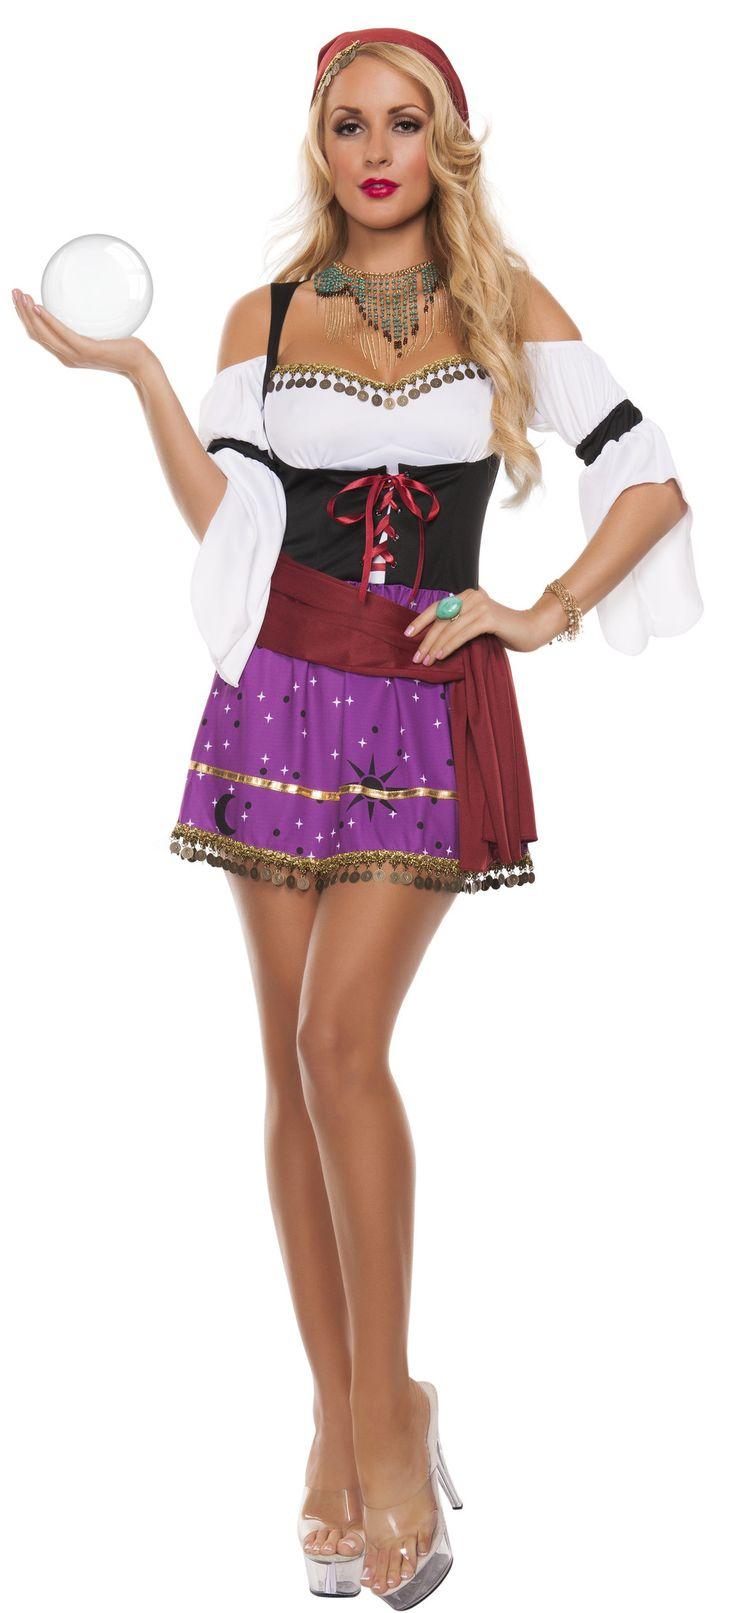 Sexy Gypsy Costume - Fortune Teller Disney Esmerelda – Costume Whore